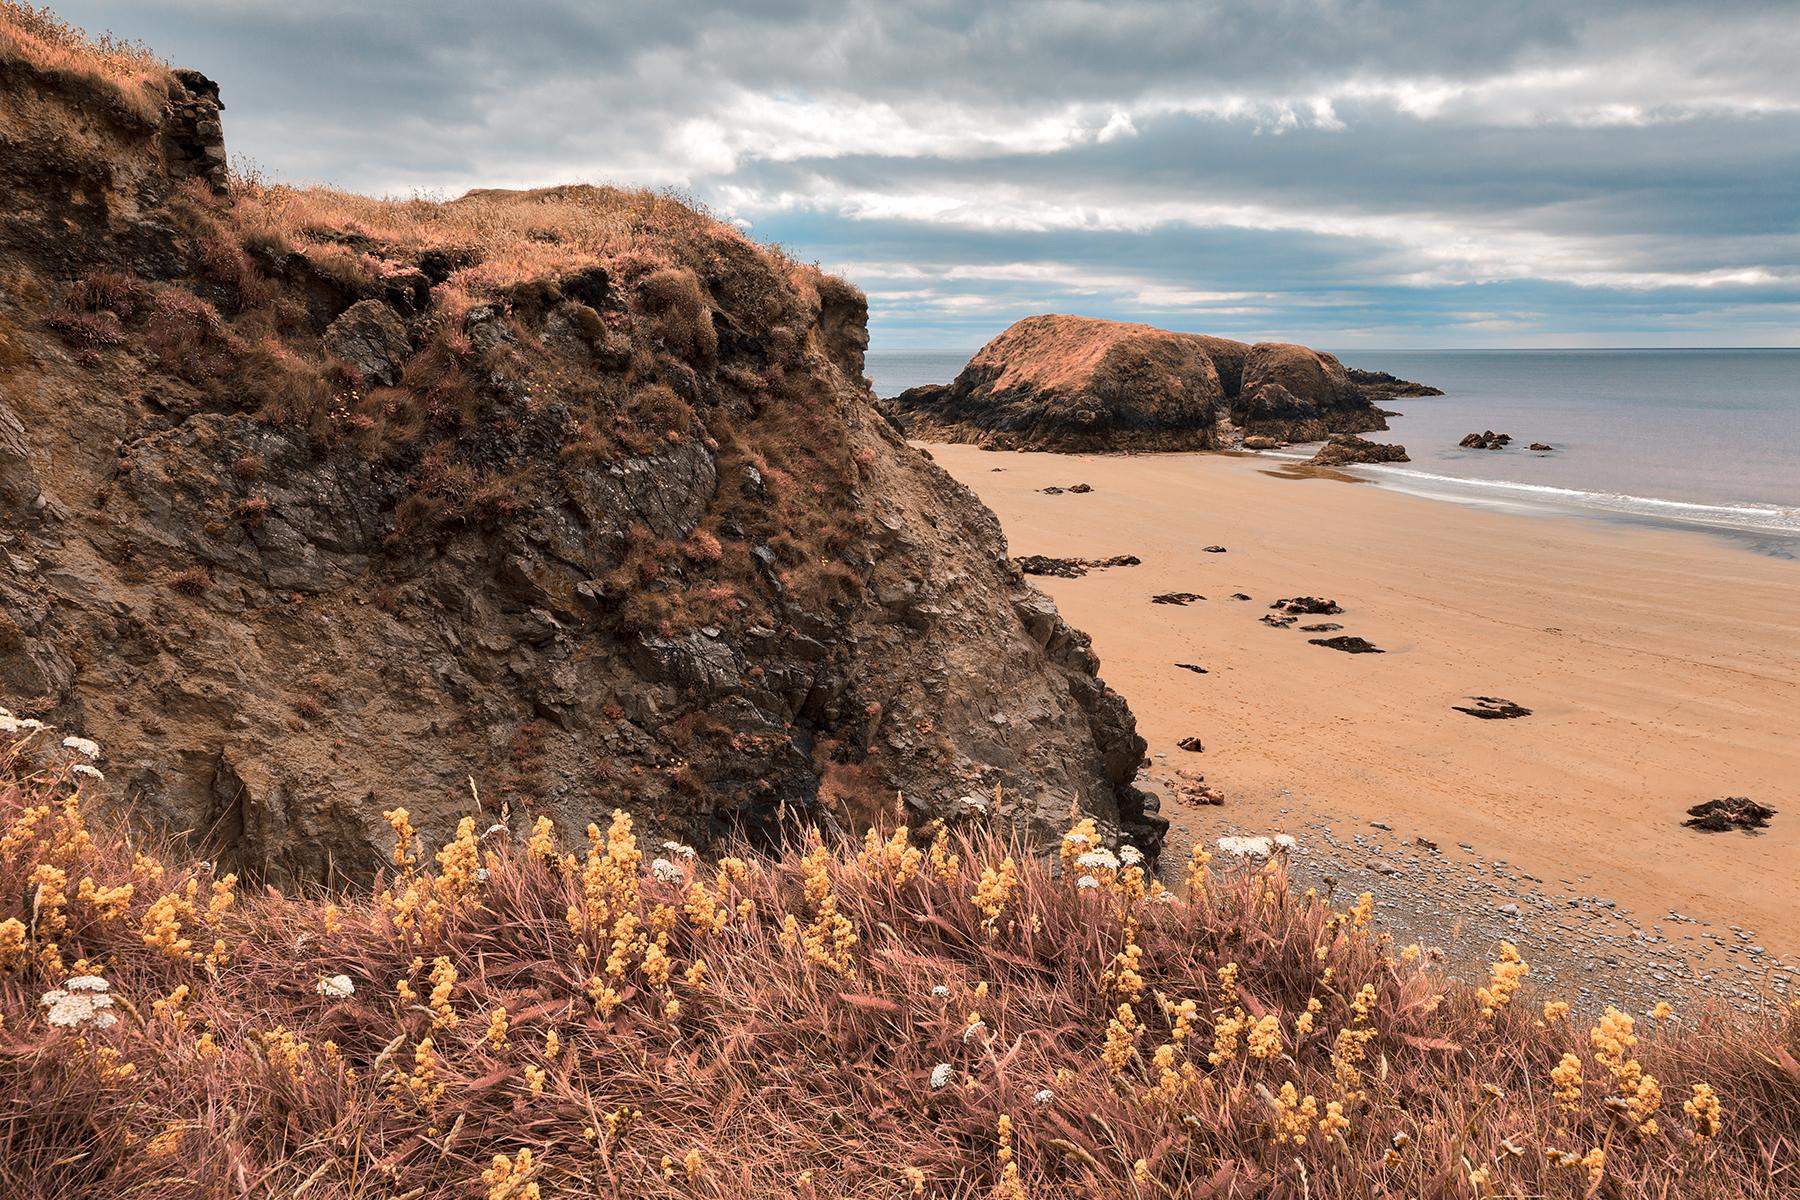 Rugged Irish Wildflower Coast - Pastel Fantasy HDR, Angle, Pristine, Scenic, Scenery, HQ Photo